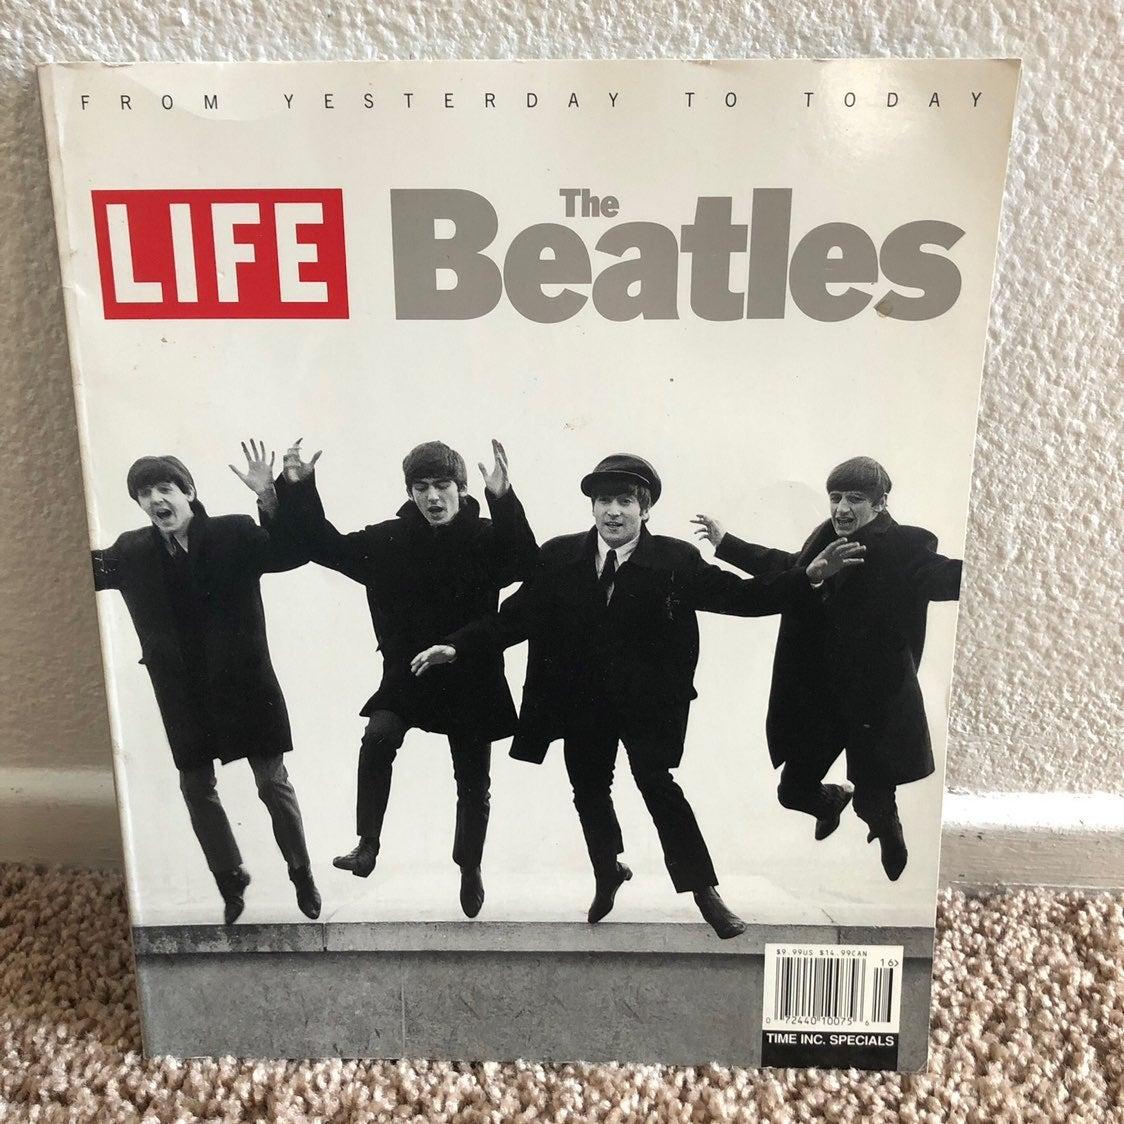 The Beatles LIFE magazine